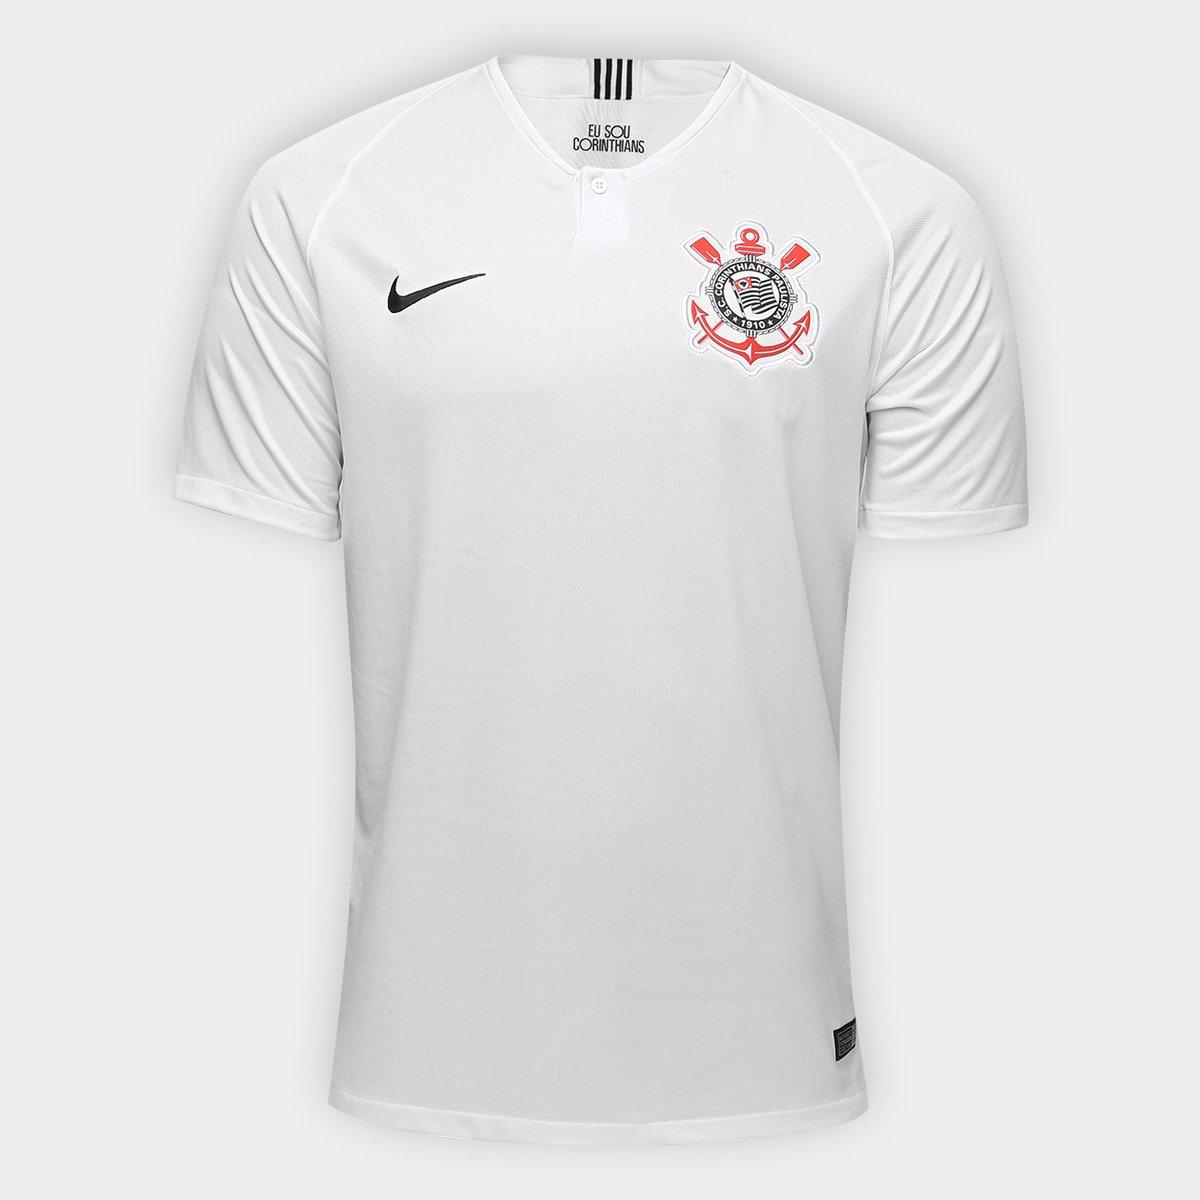 ca303e243fa11 Camisa Corinthians I 18 19 s n° Torcedor Nike Masculina - Branco e Preto -  Compre Agora